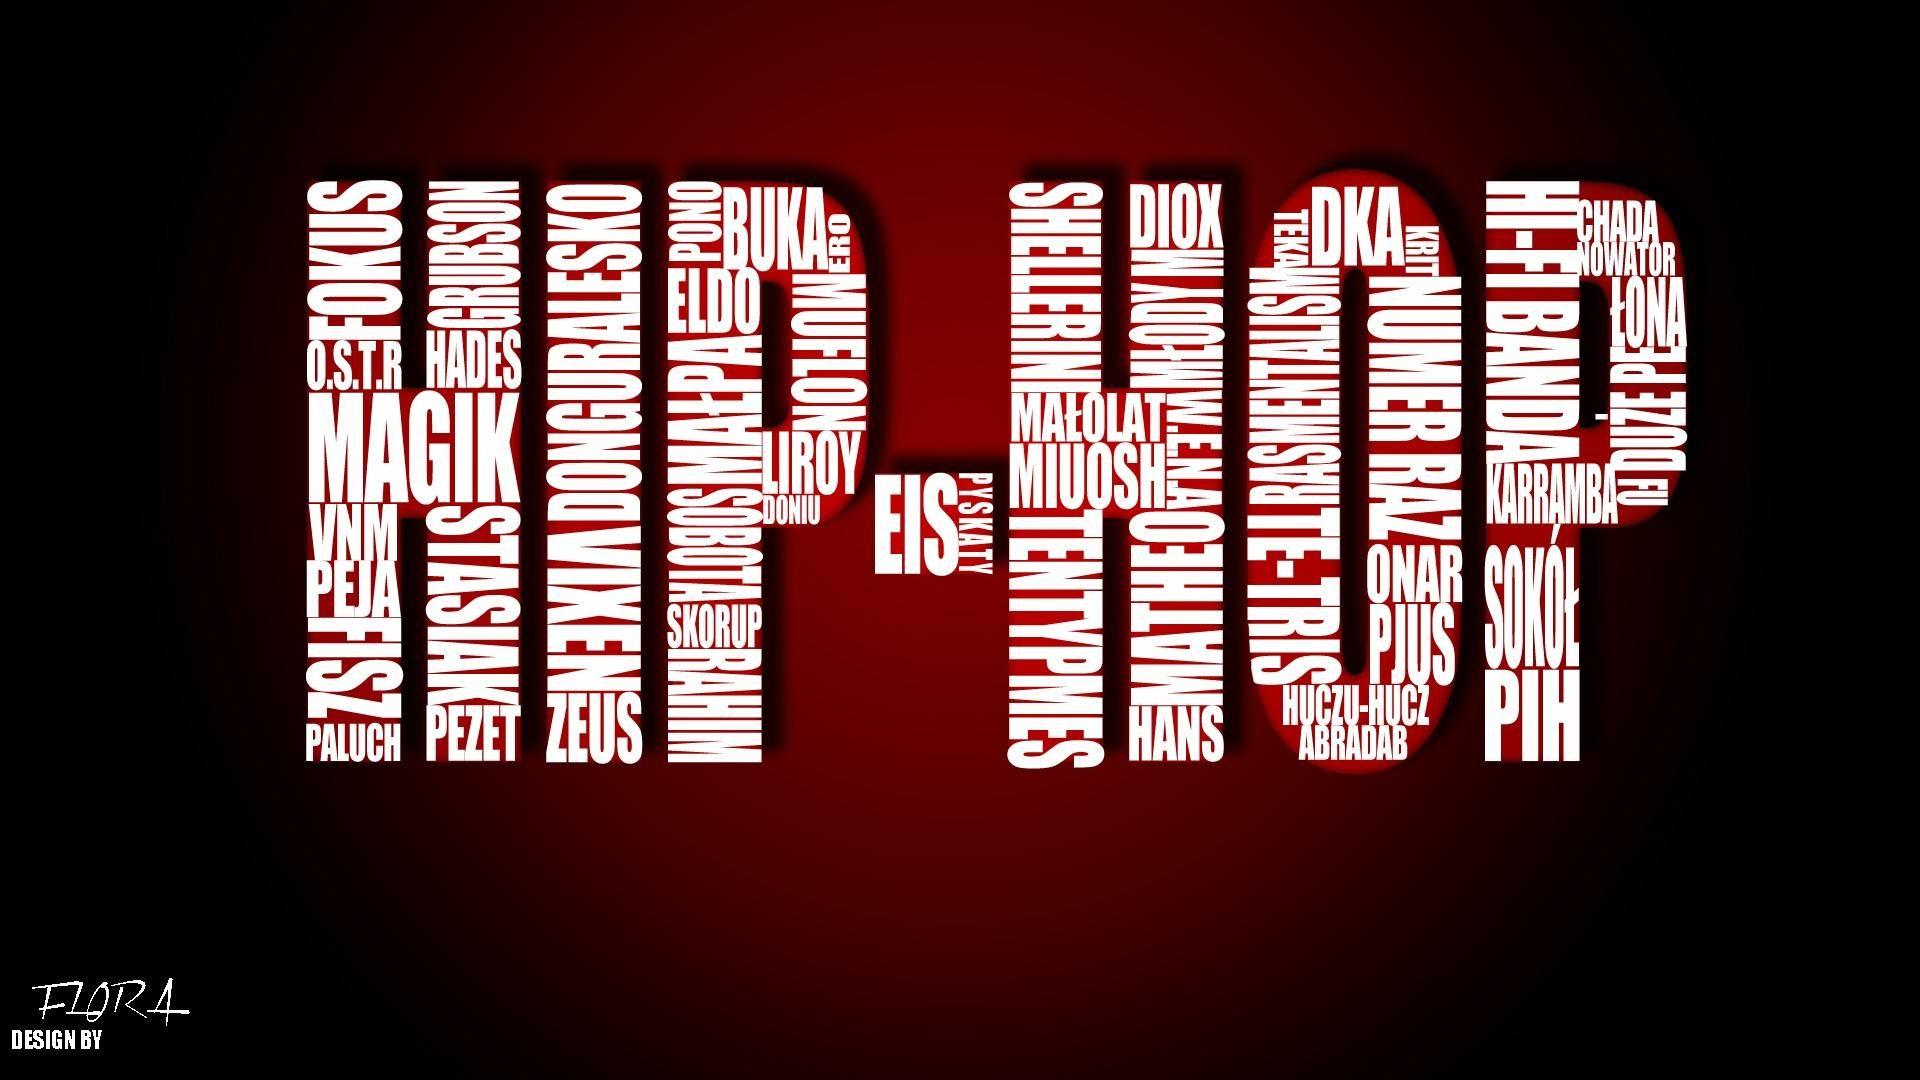 Love and Hip Hop Wallpaper 600×645 Hip Hop Wallpapers (49 Wallpapers) |  Adorable Wallpapers | Wallpapers | Pinterest